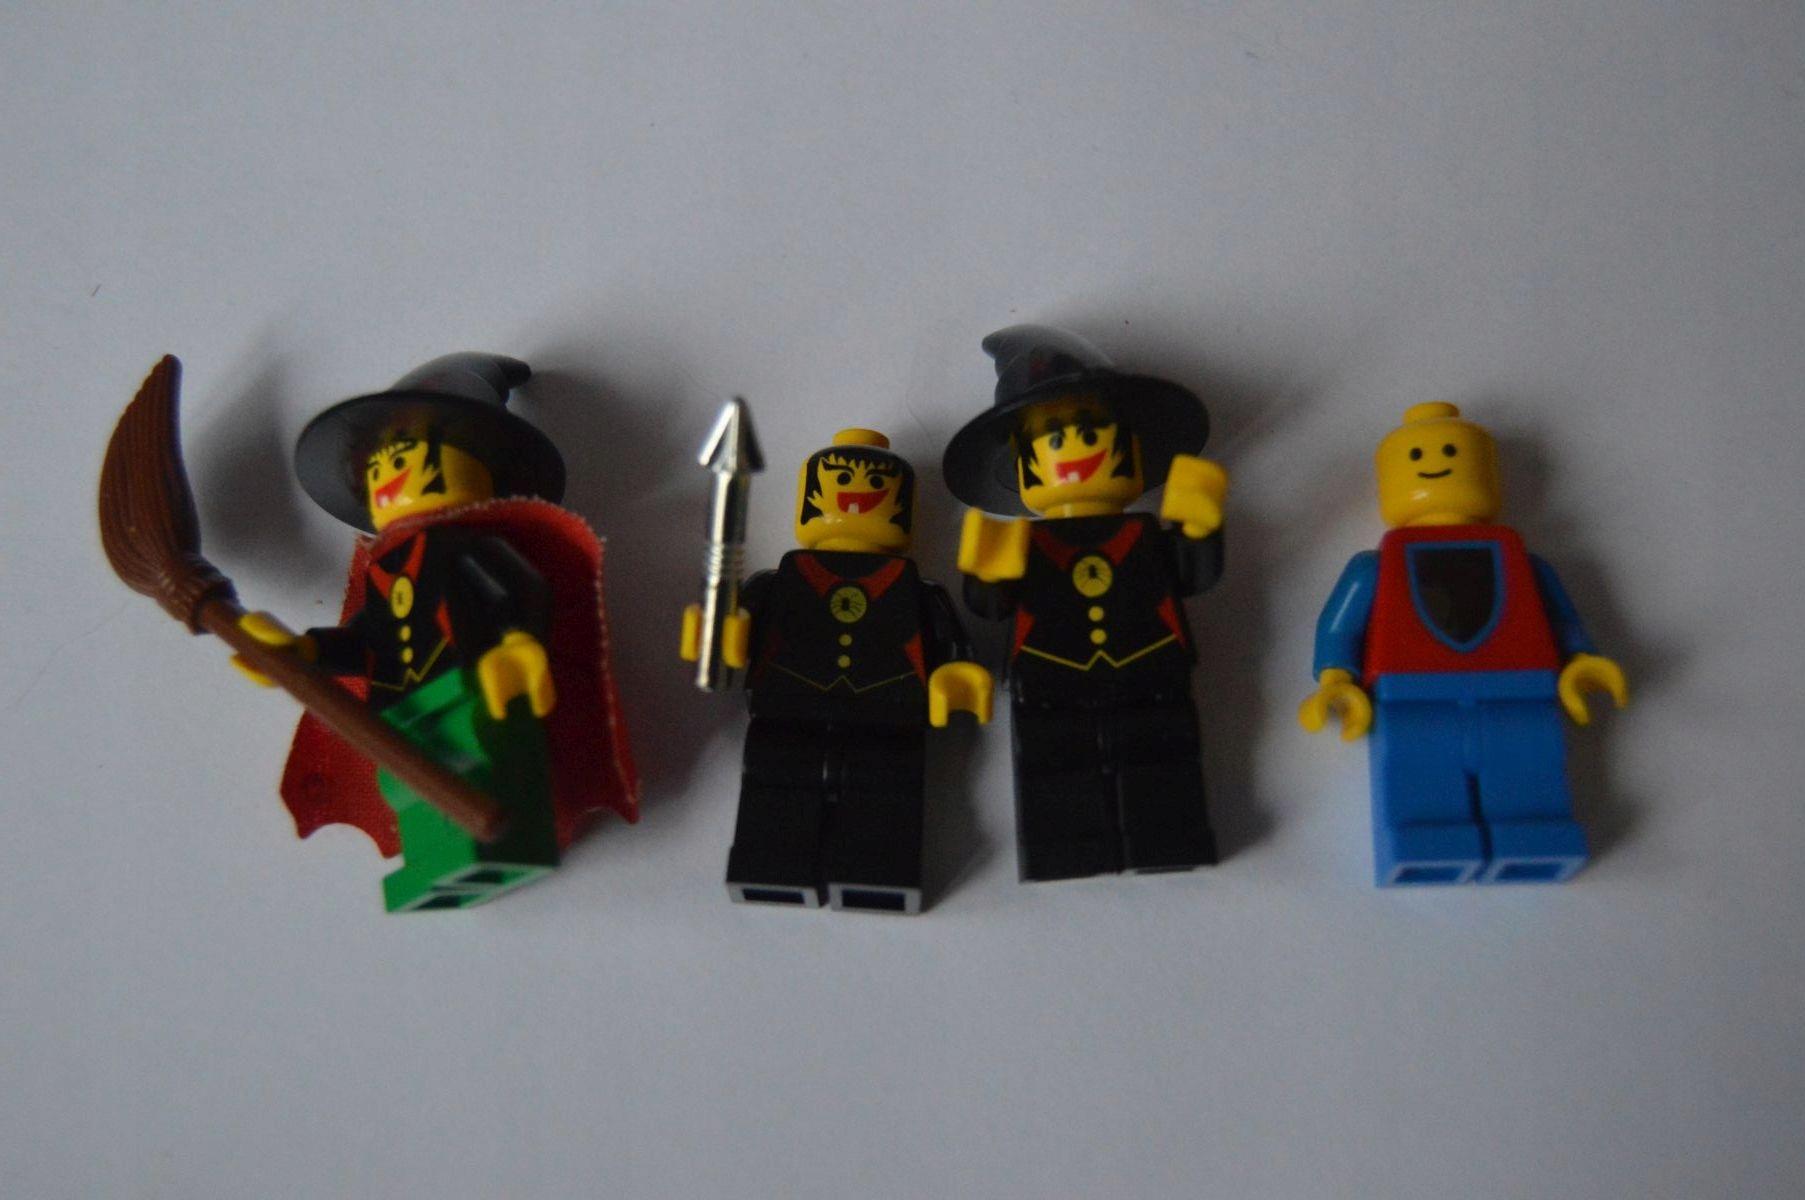 283 Lego Castle rycerze figurki